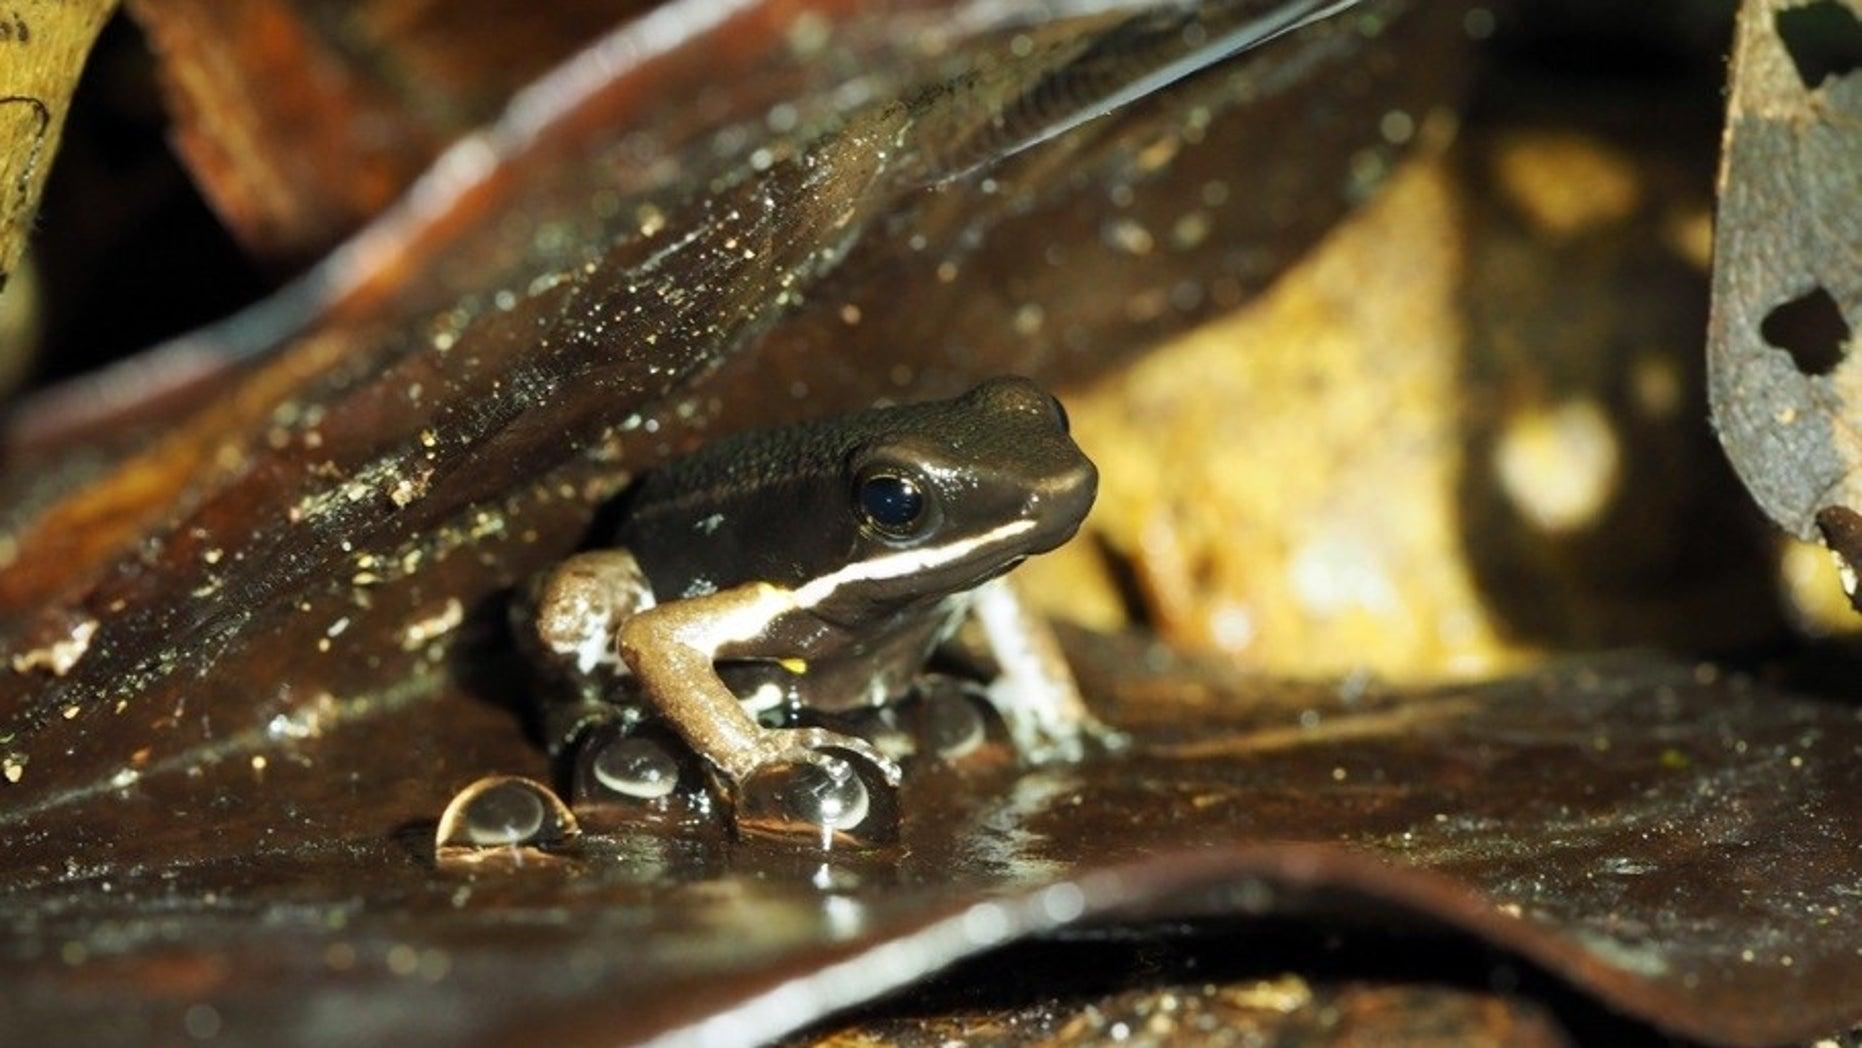 A male poison frog (<em>Allobates femoralis</em>) guards a clutch of eggs laid on leaf litter.